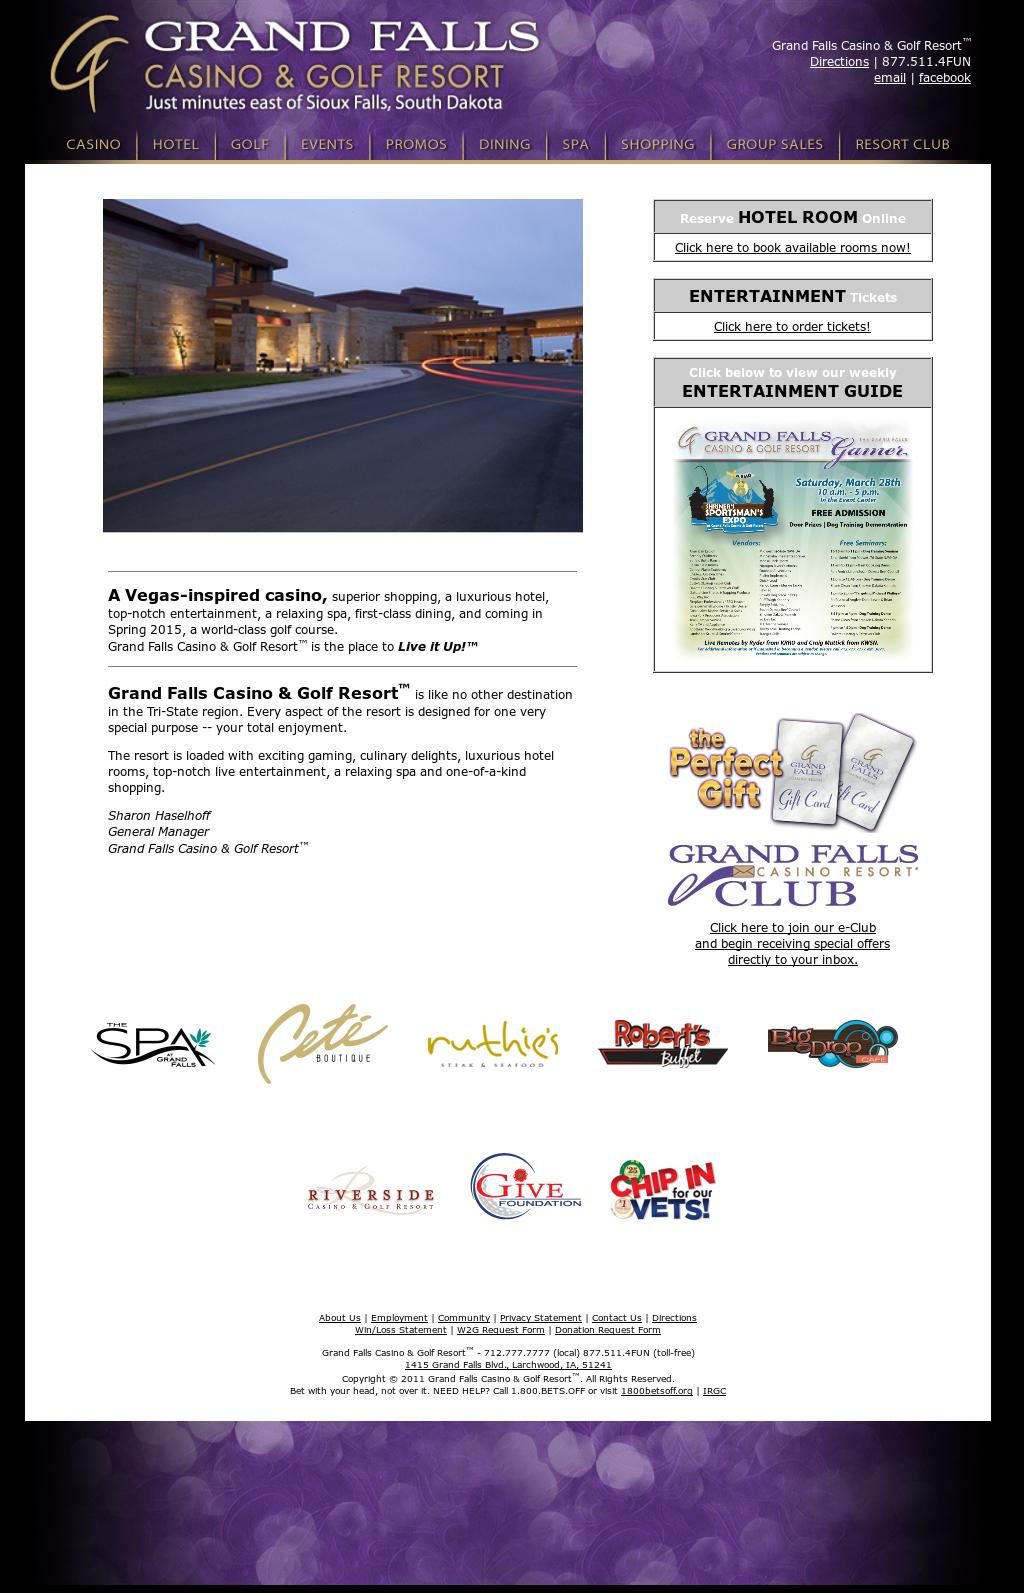 Grand Falls Casino Resort Competitors, Revenue and Employees